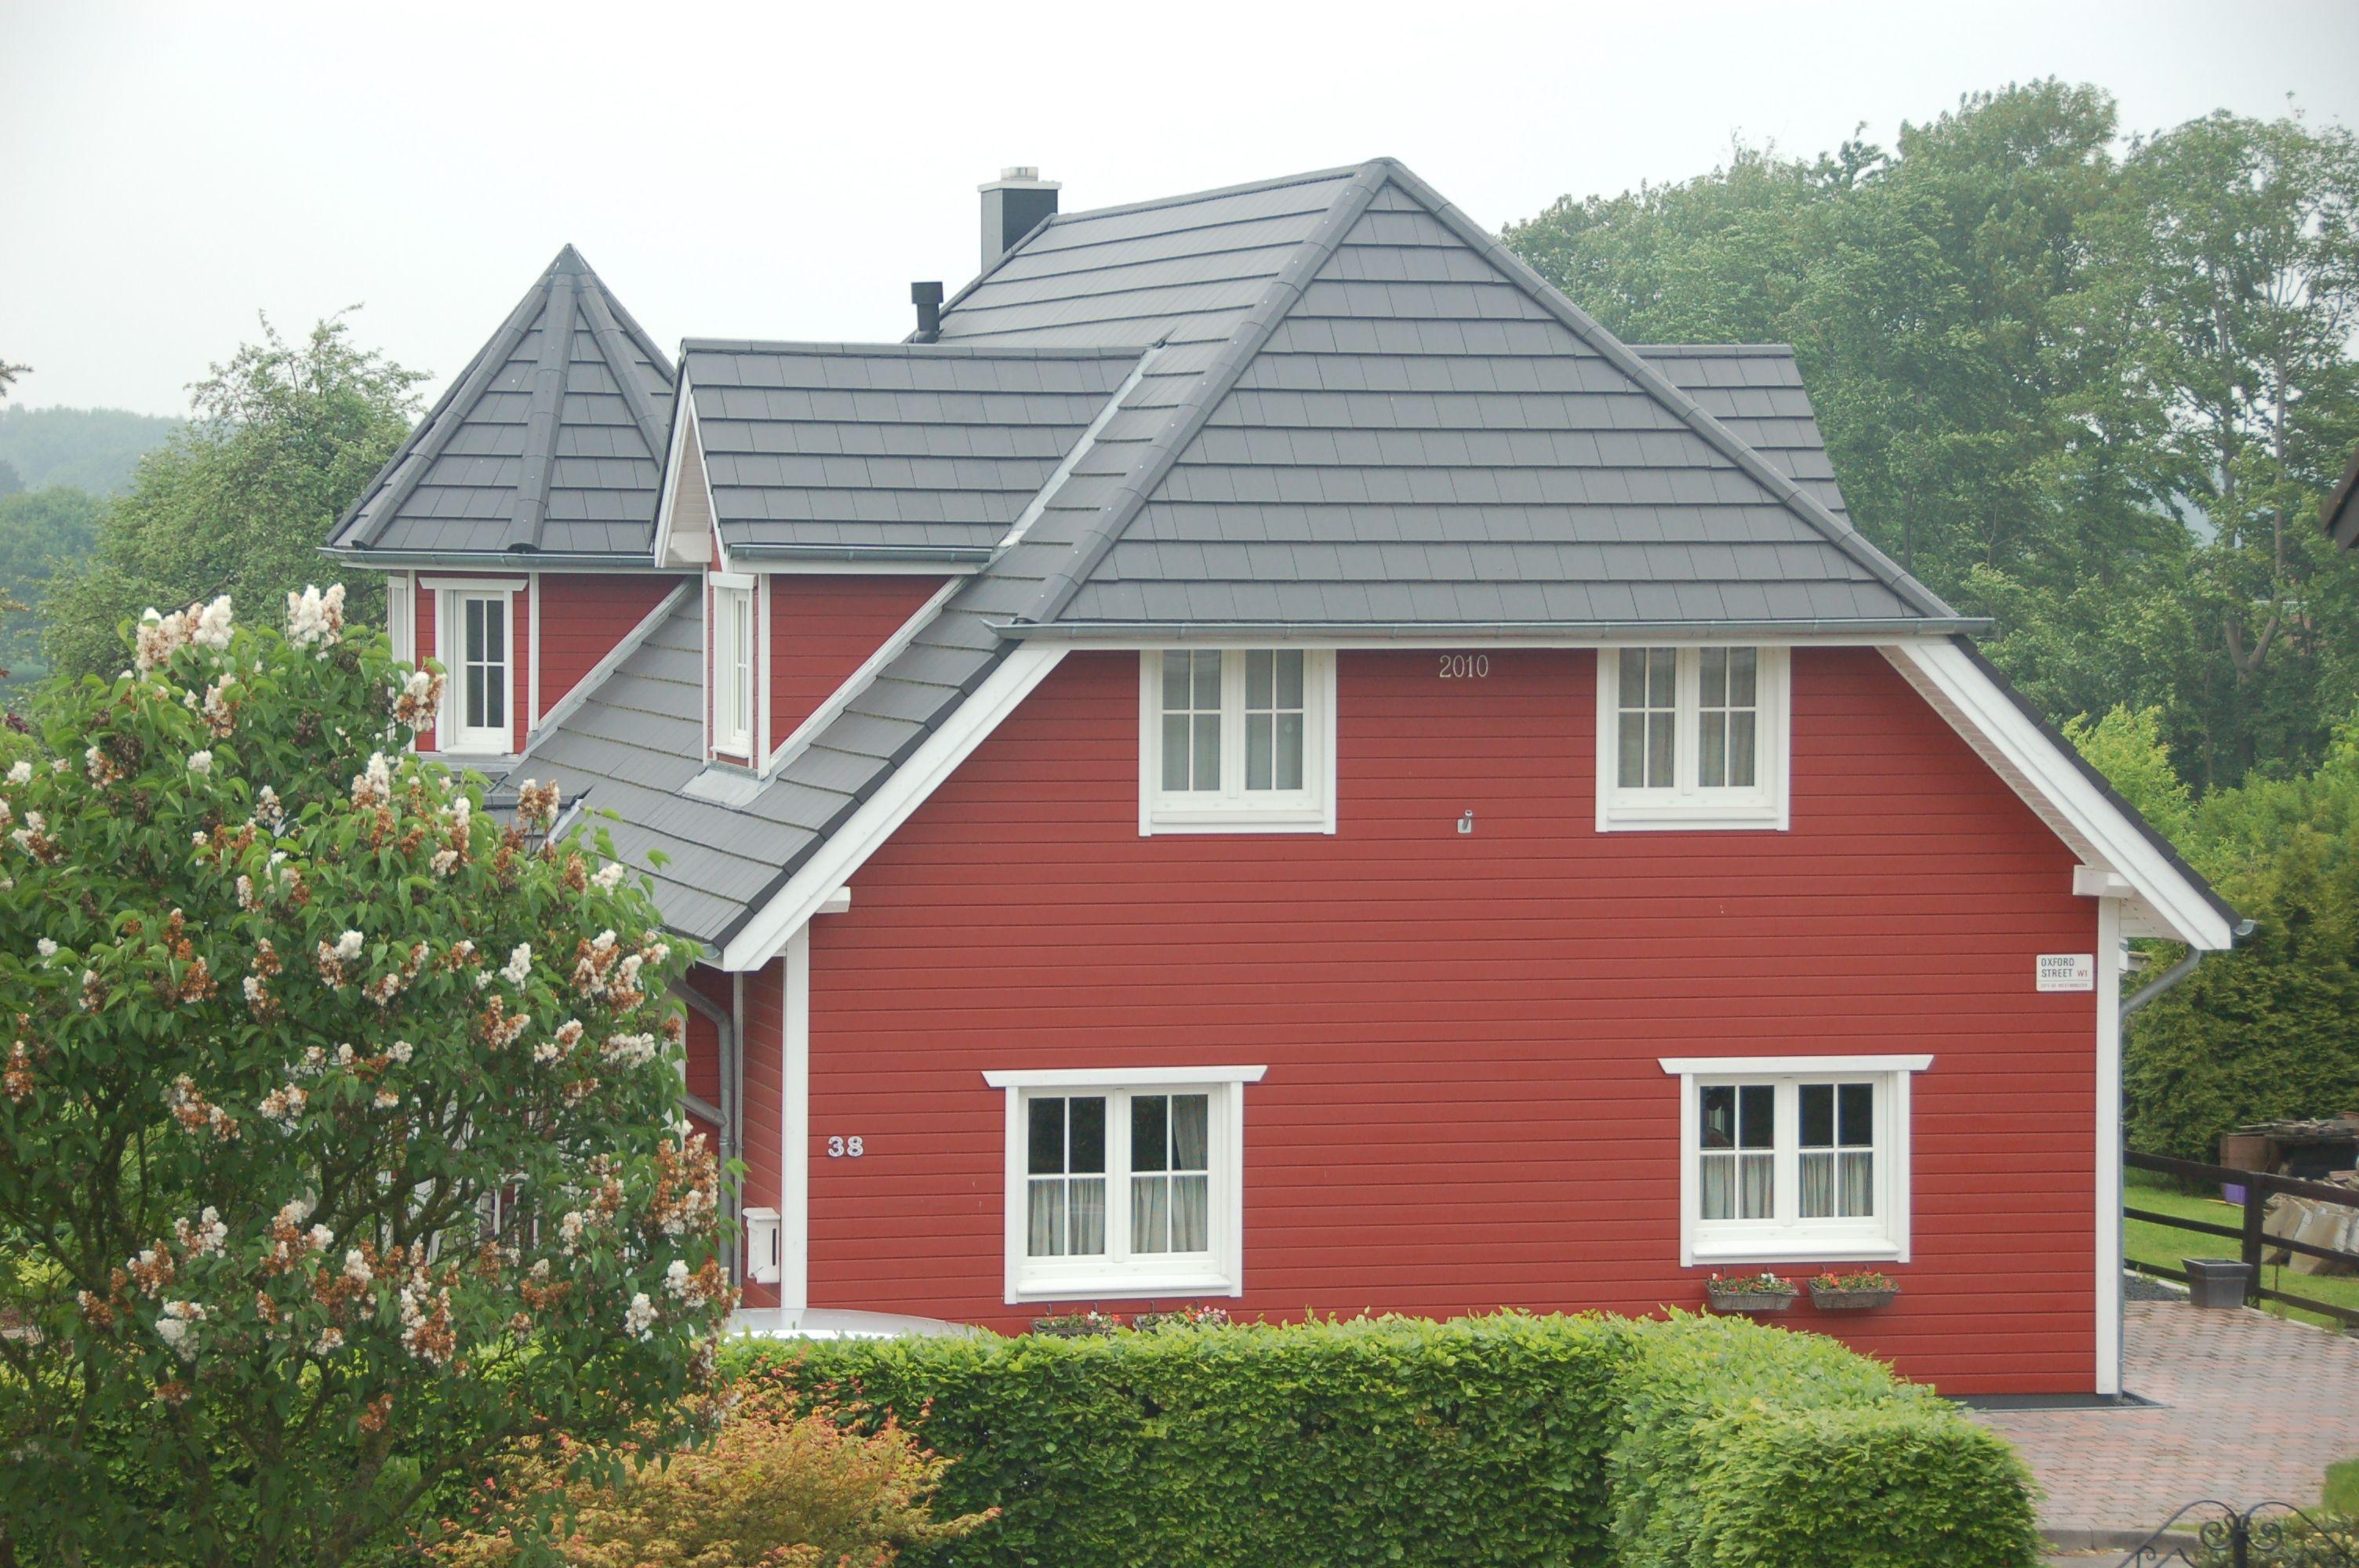 Color for wooden houses. Farbe für Holzhäuser